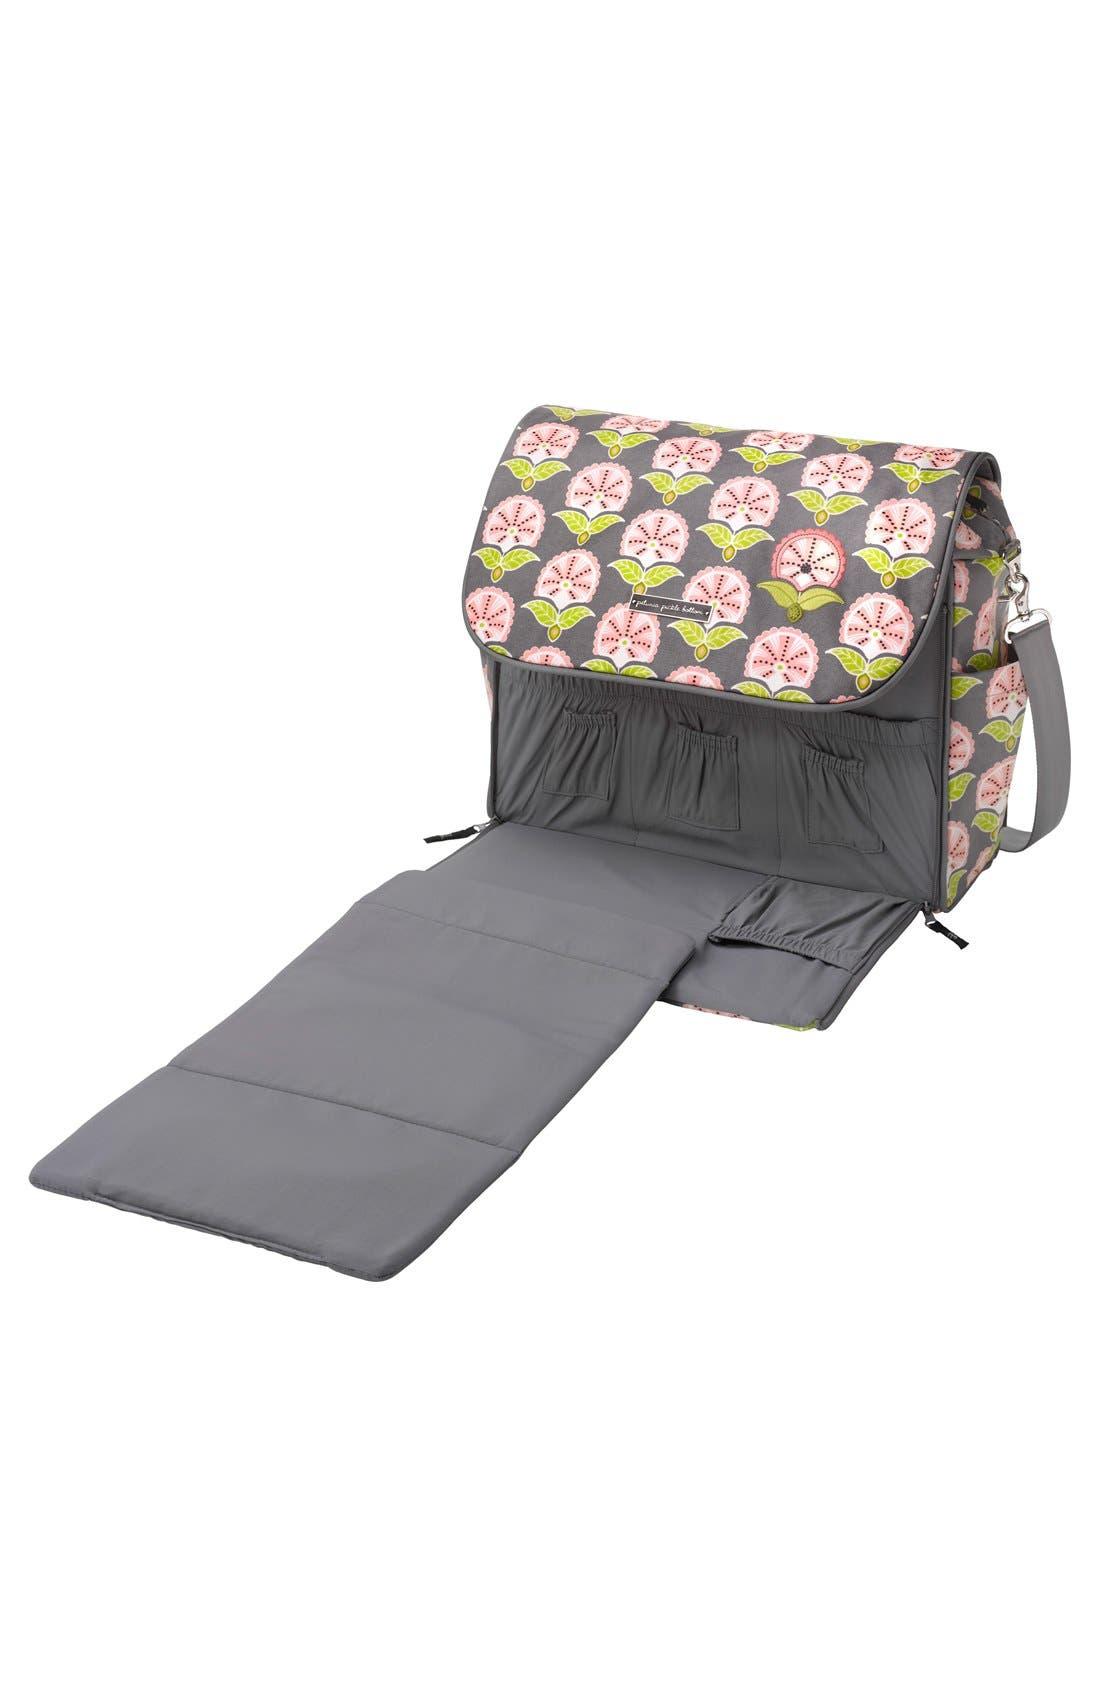 Alternate Image 3  - Petunia Pickle Bottom 'Glazed Abundance' Boxy Diaper Backpack